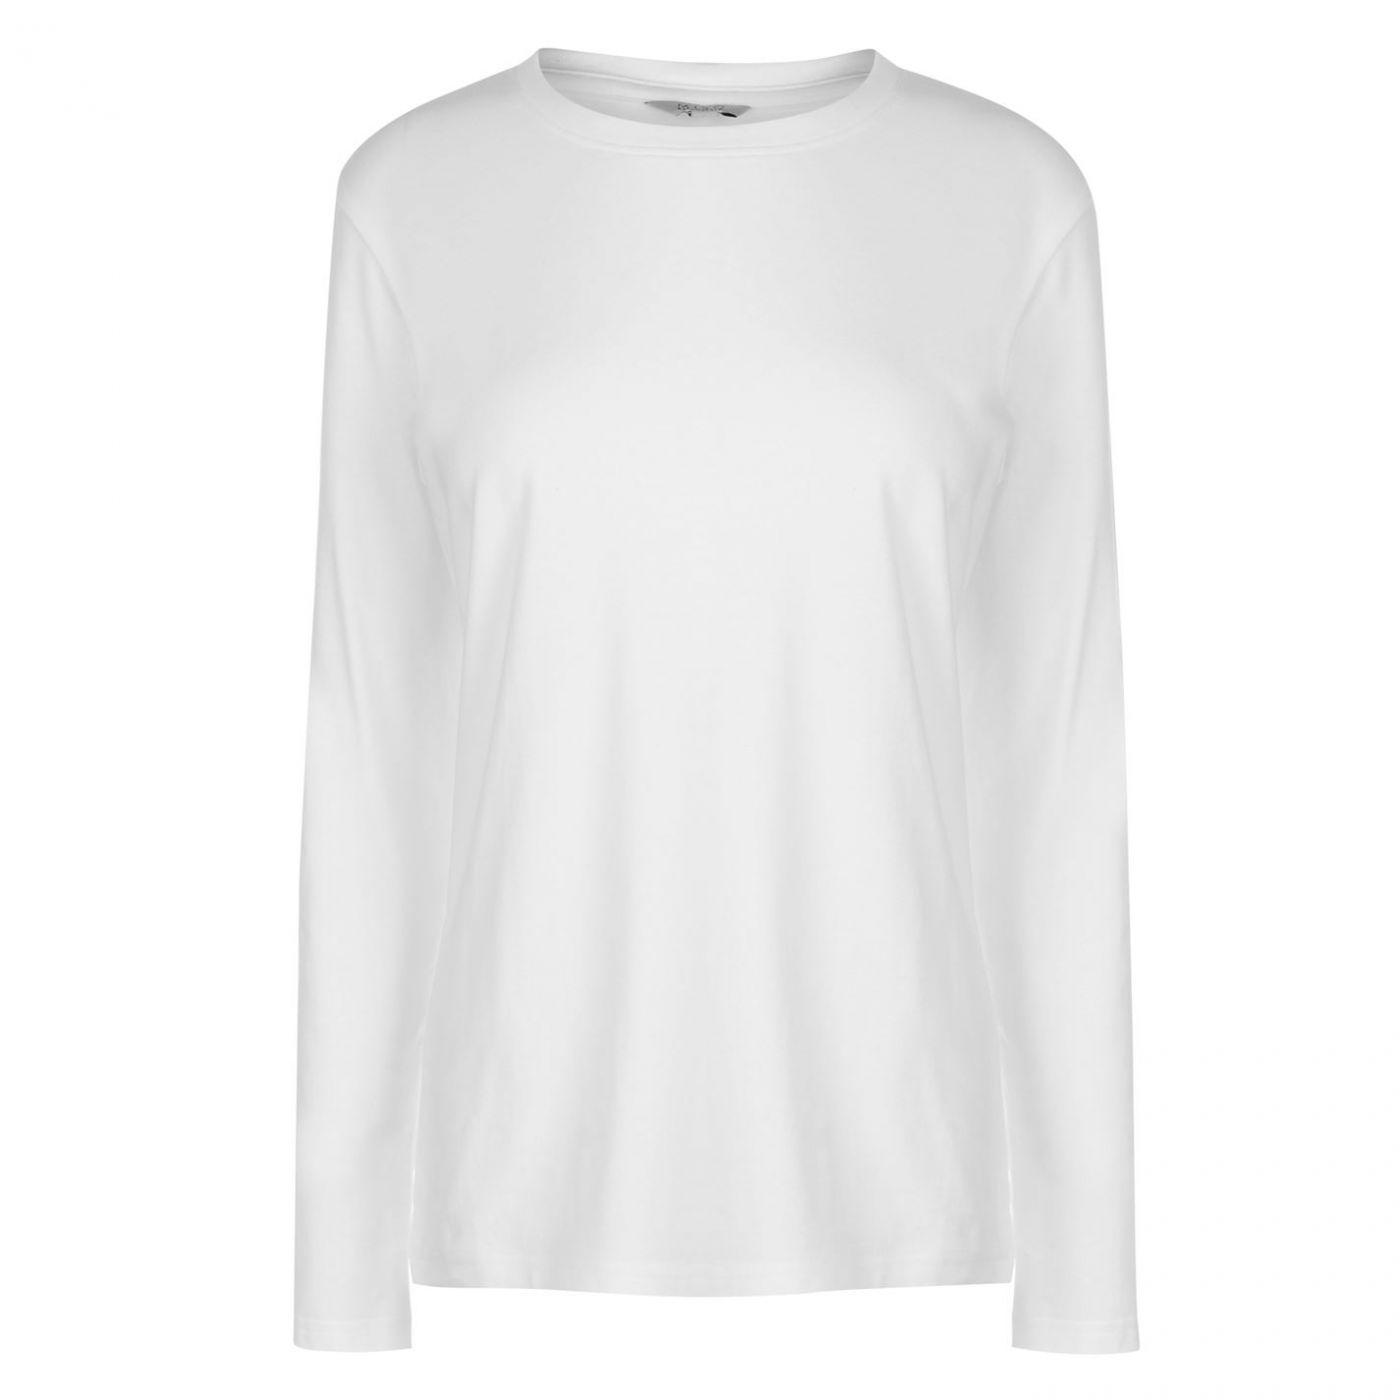 Miso Long Sleeve T Shirt Ladies